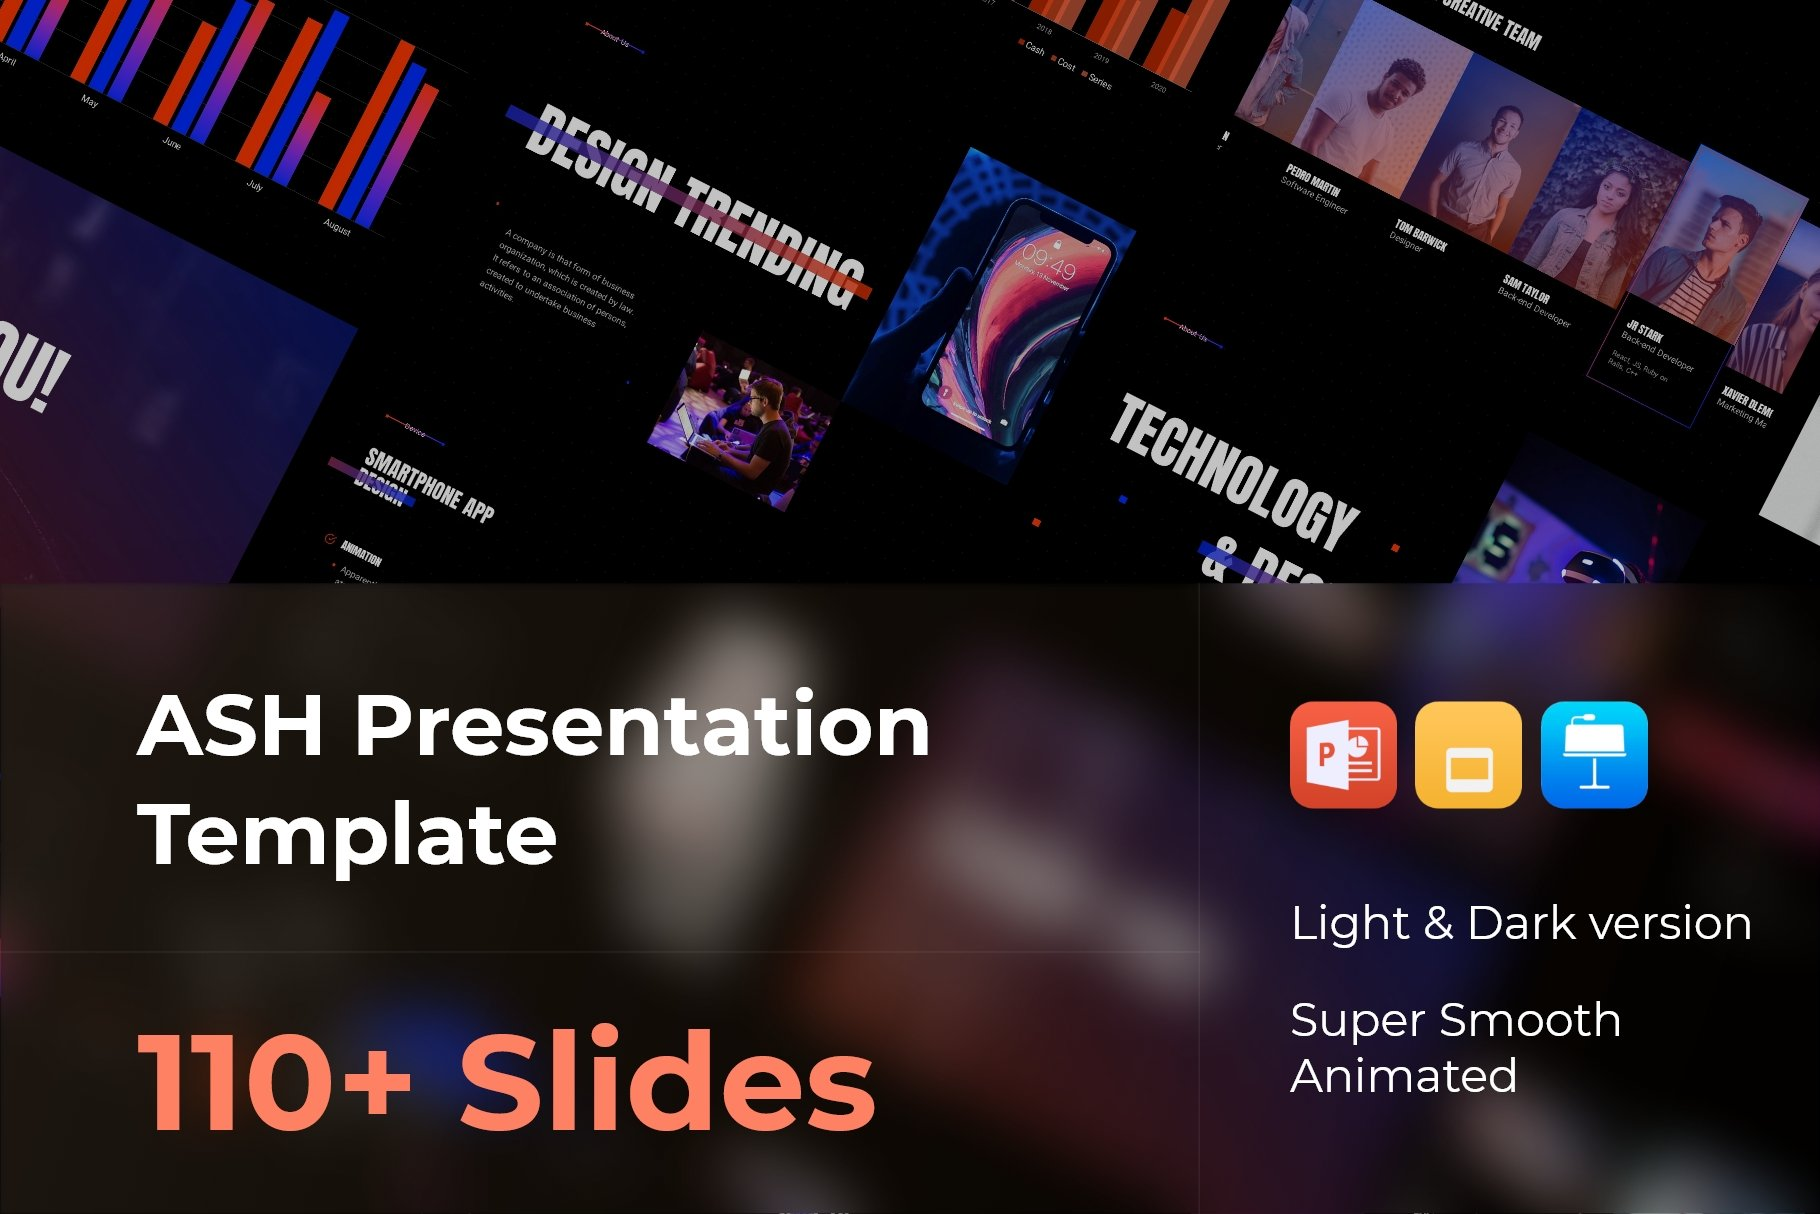 Ash - Smooth Animated Presentation.